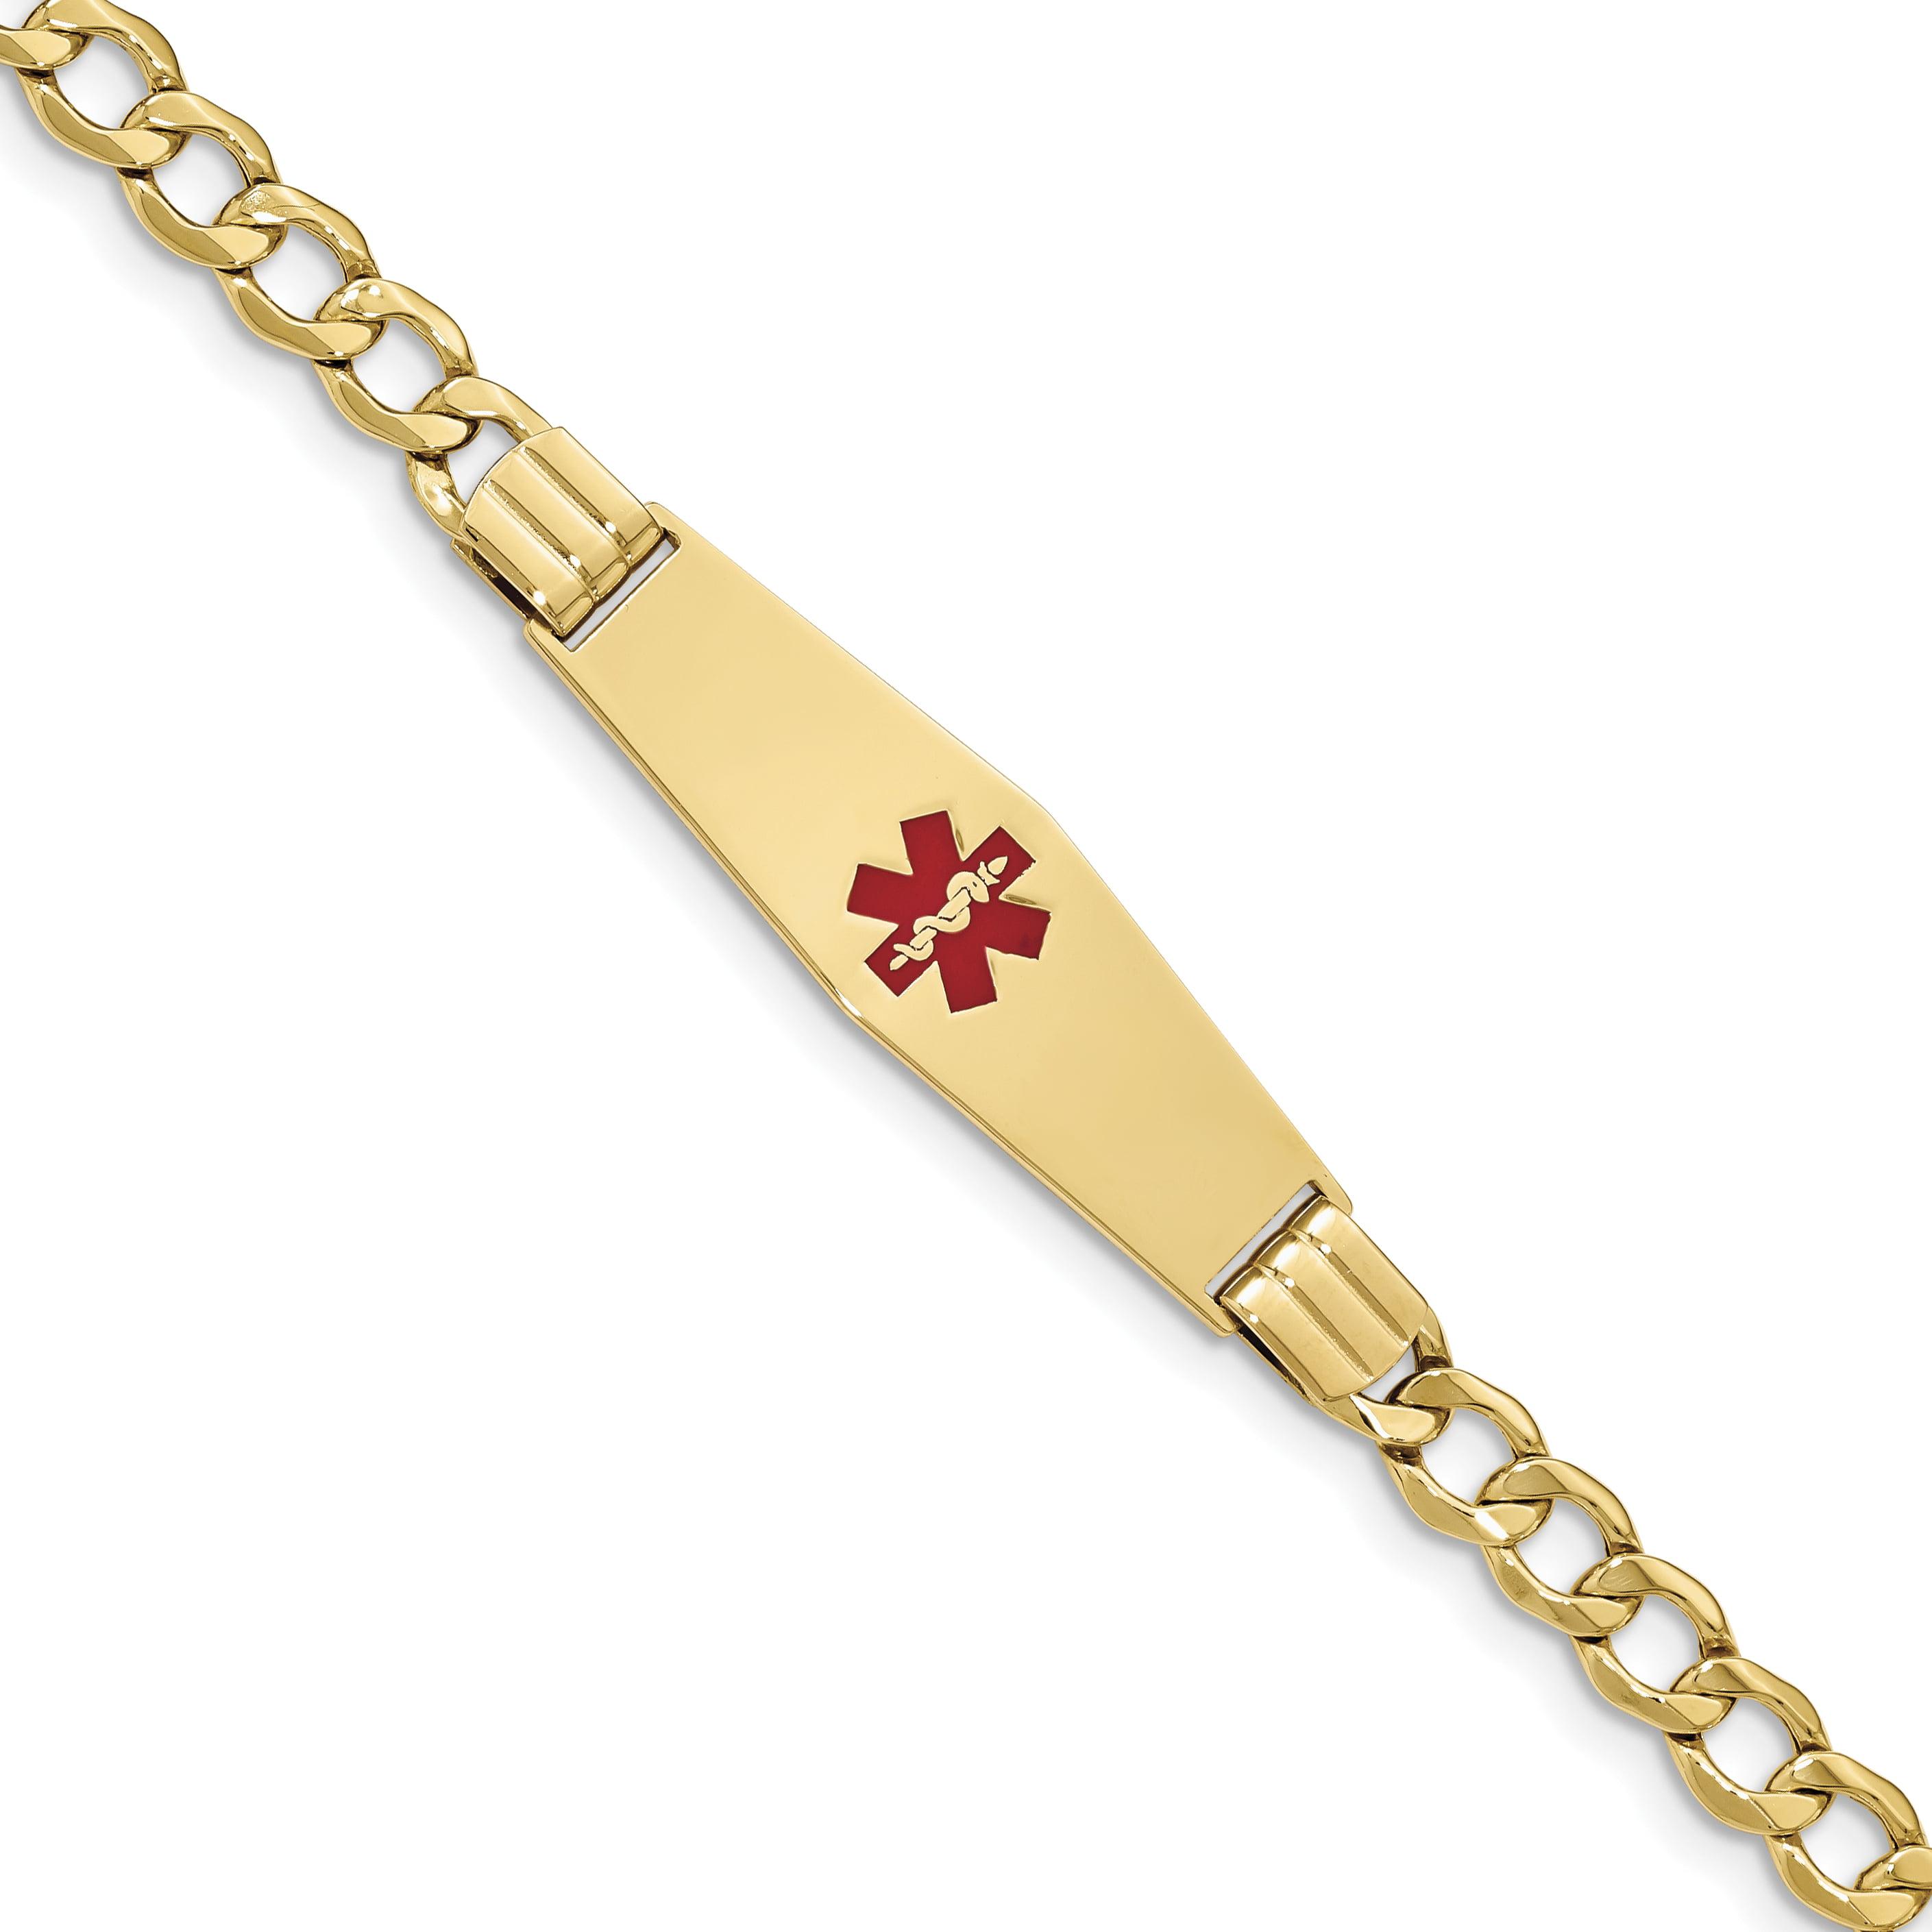 14K Medical Soft Diamond Shape Red Enamel Curb Link 5.9mm ID Bracelet by Core Gold